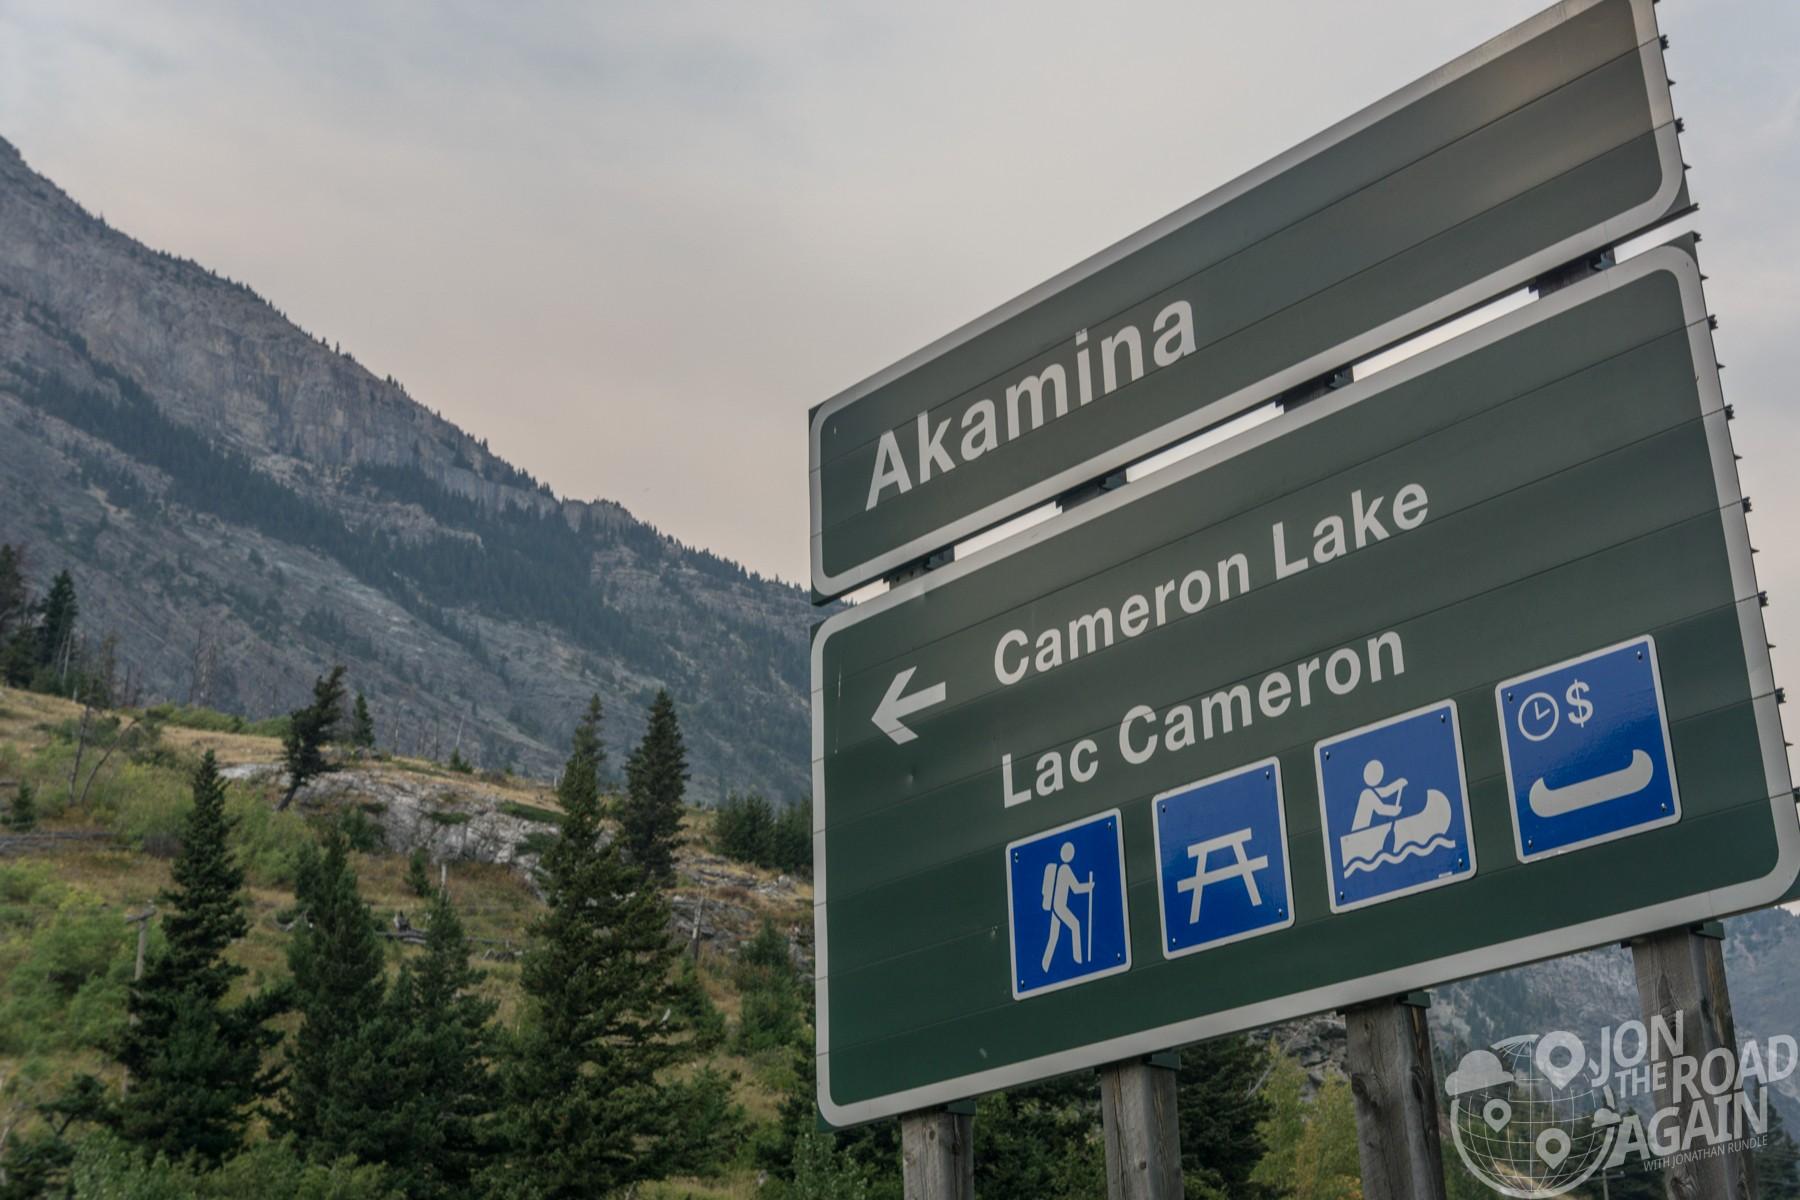 Road sign to Cameron Lake